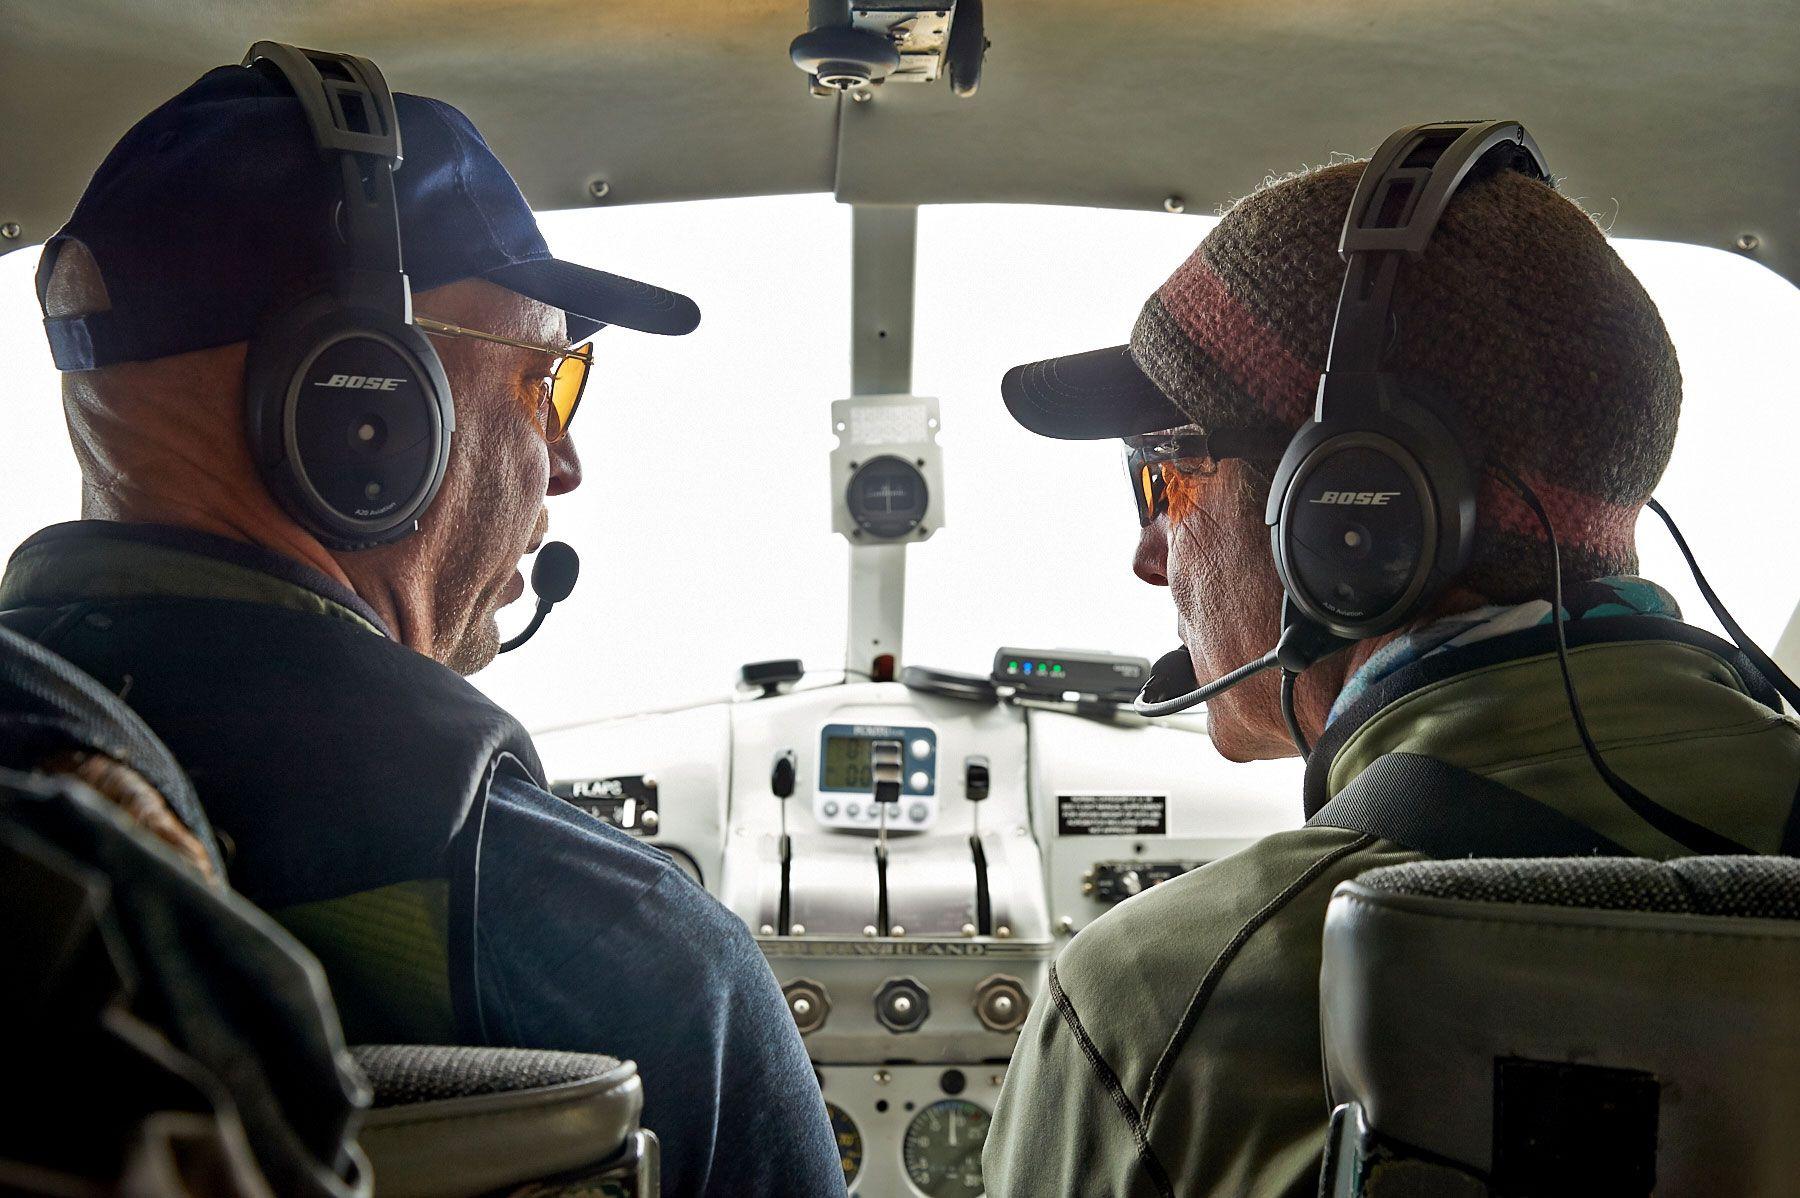 Bush pilots, Alaska, de Havilland Beaver, adventure travel, fishing guides, pilots,